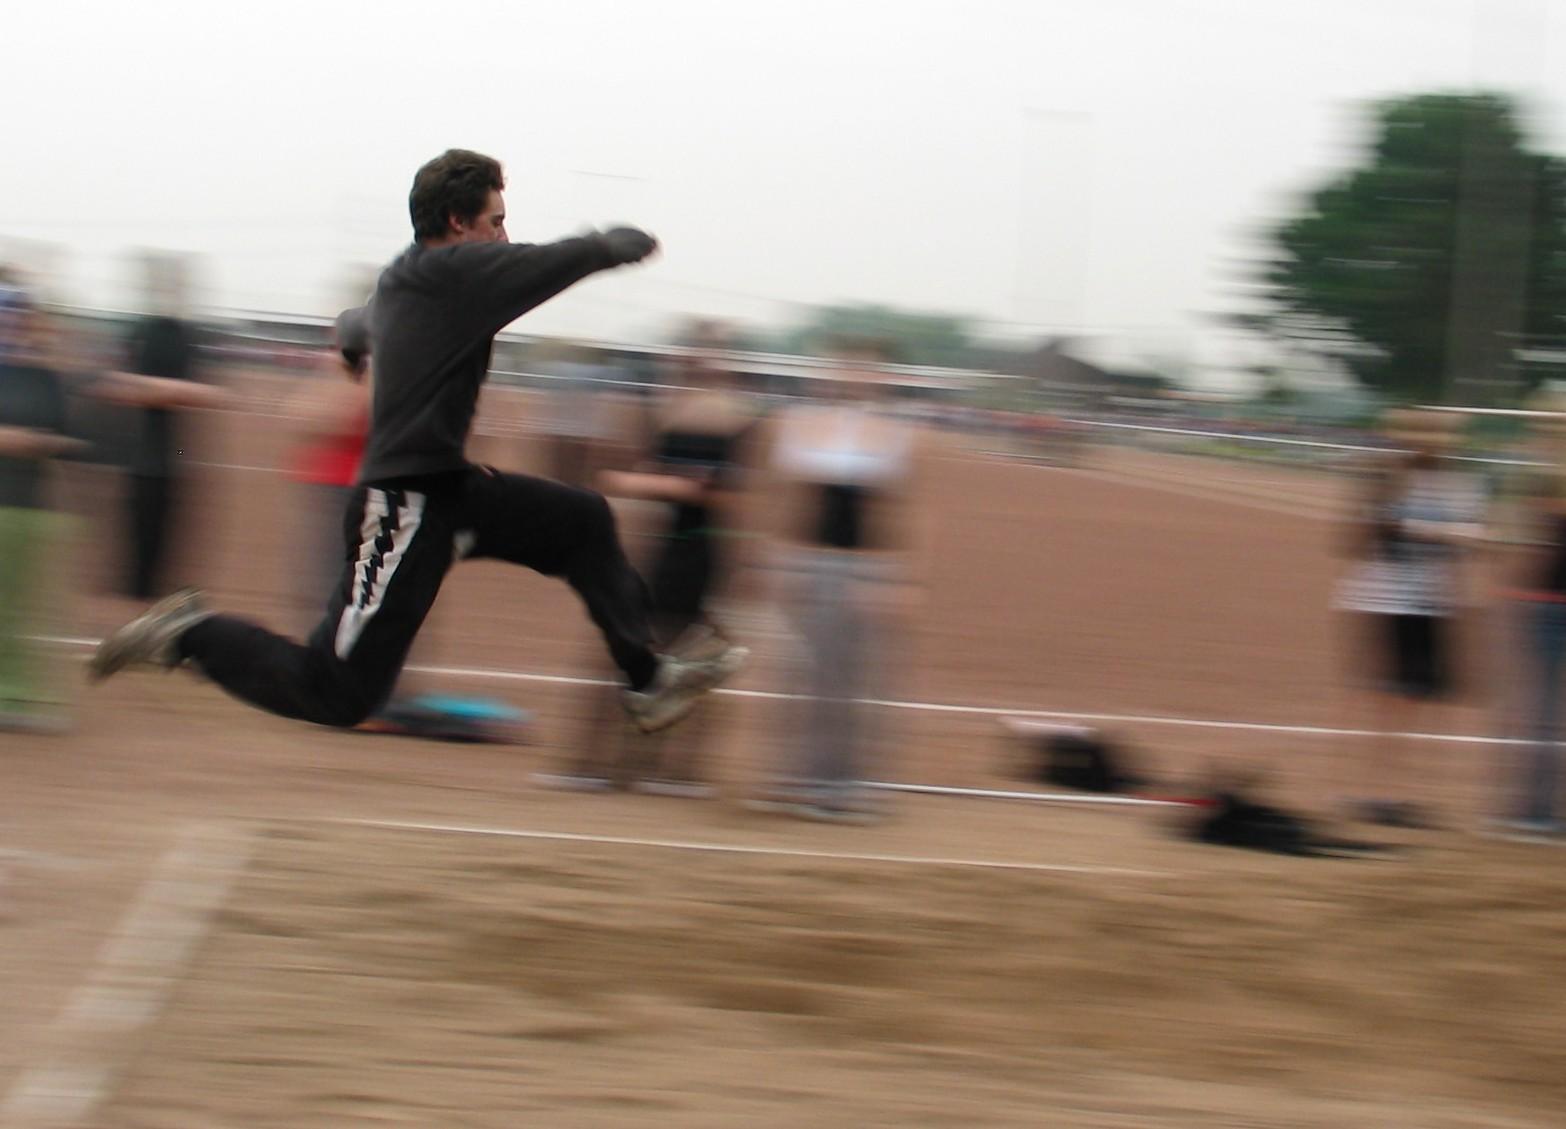 sportfest_08_sprung_03.jpg - 208,98 kB